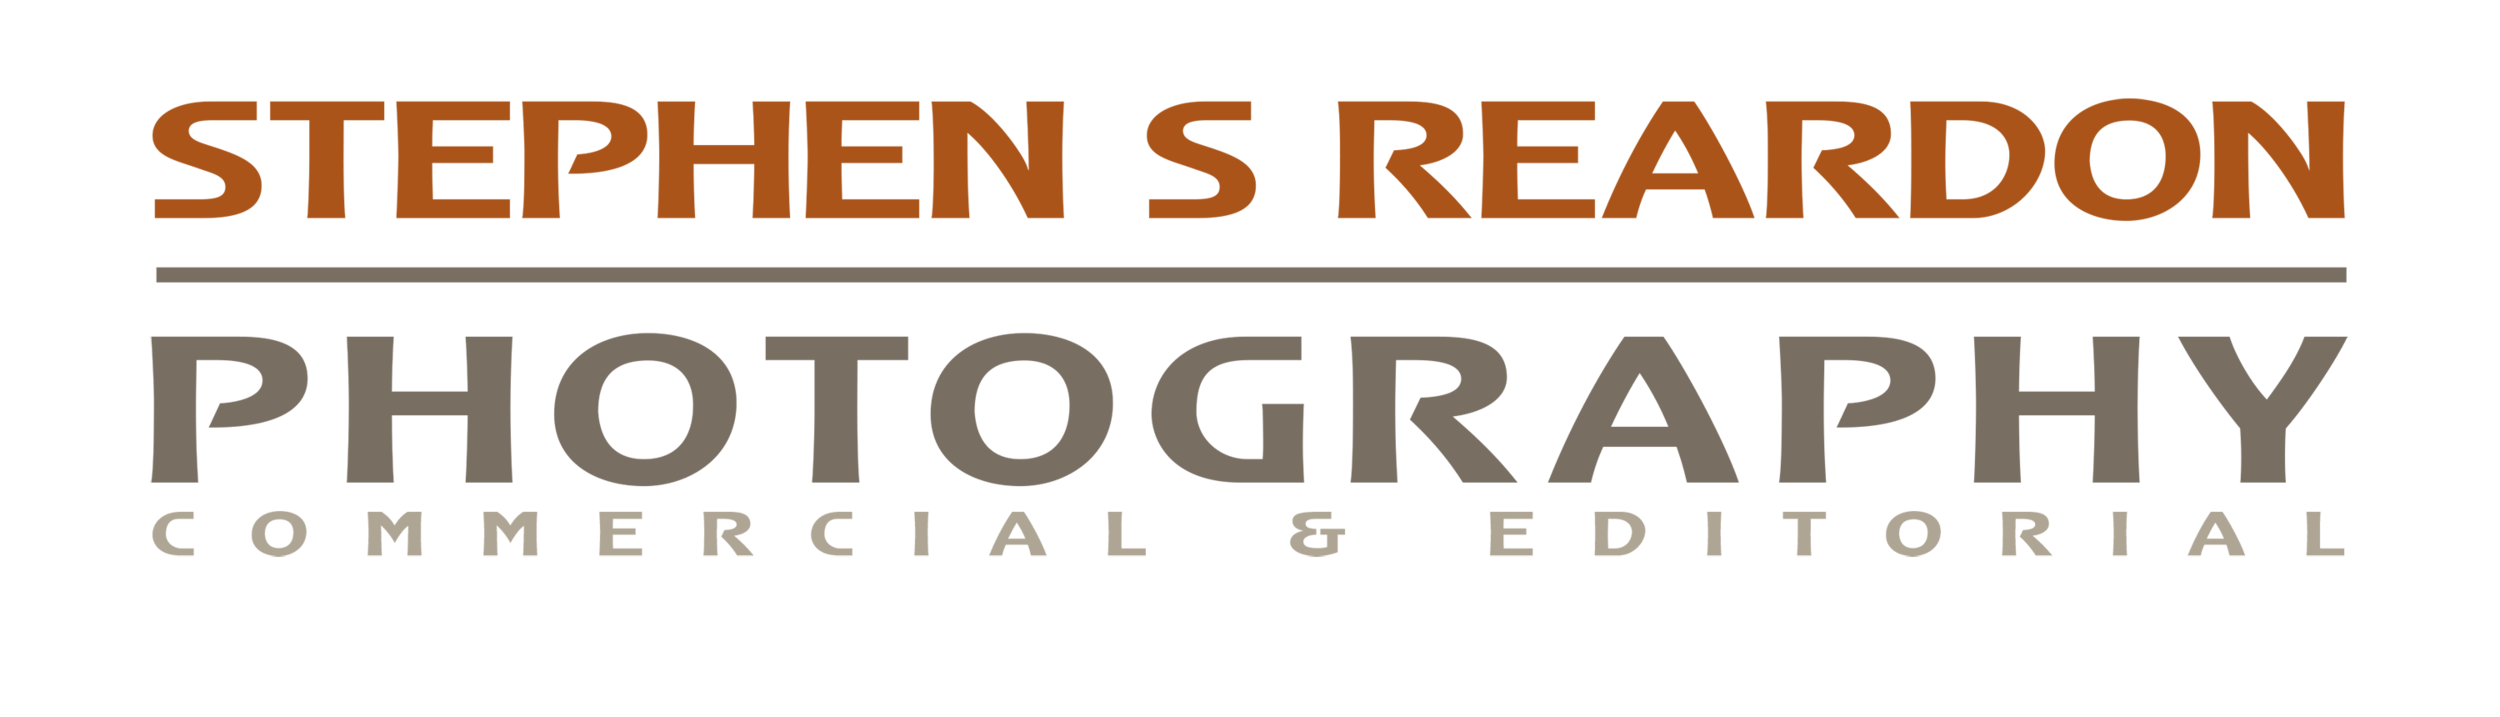 Stephen S Reardon_Logo_R1.png